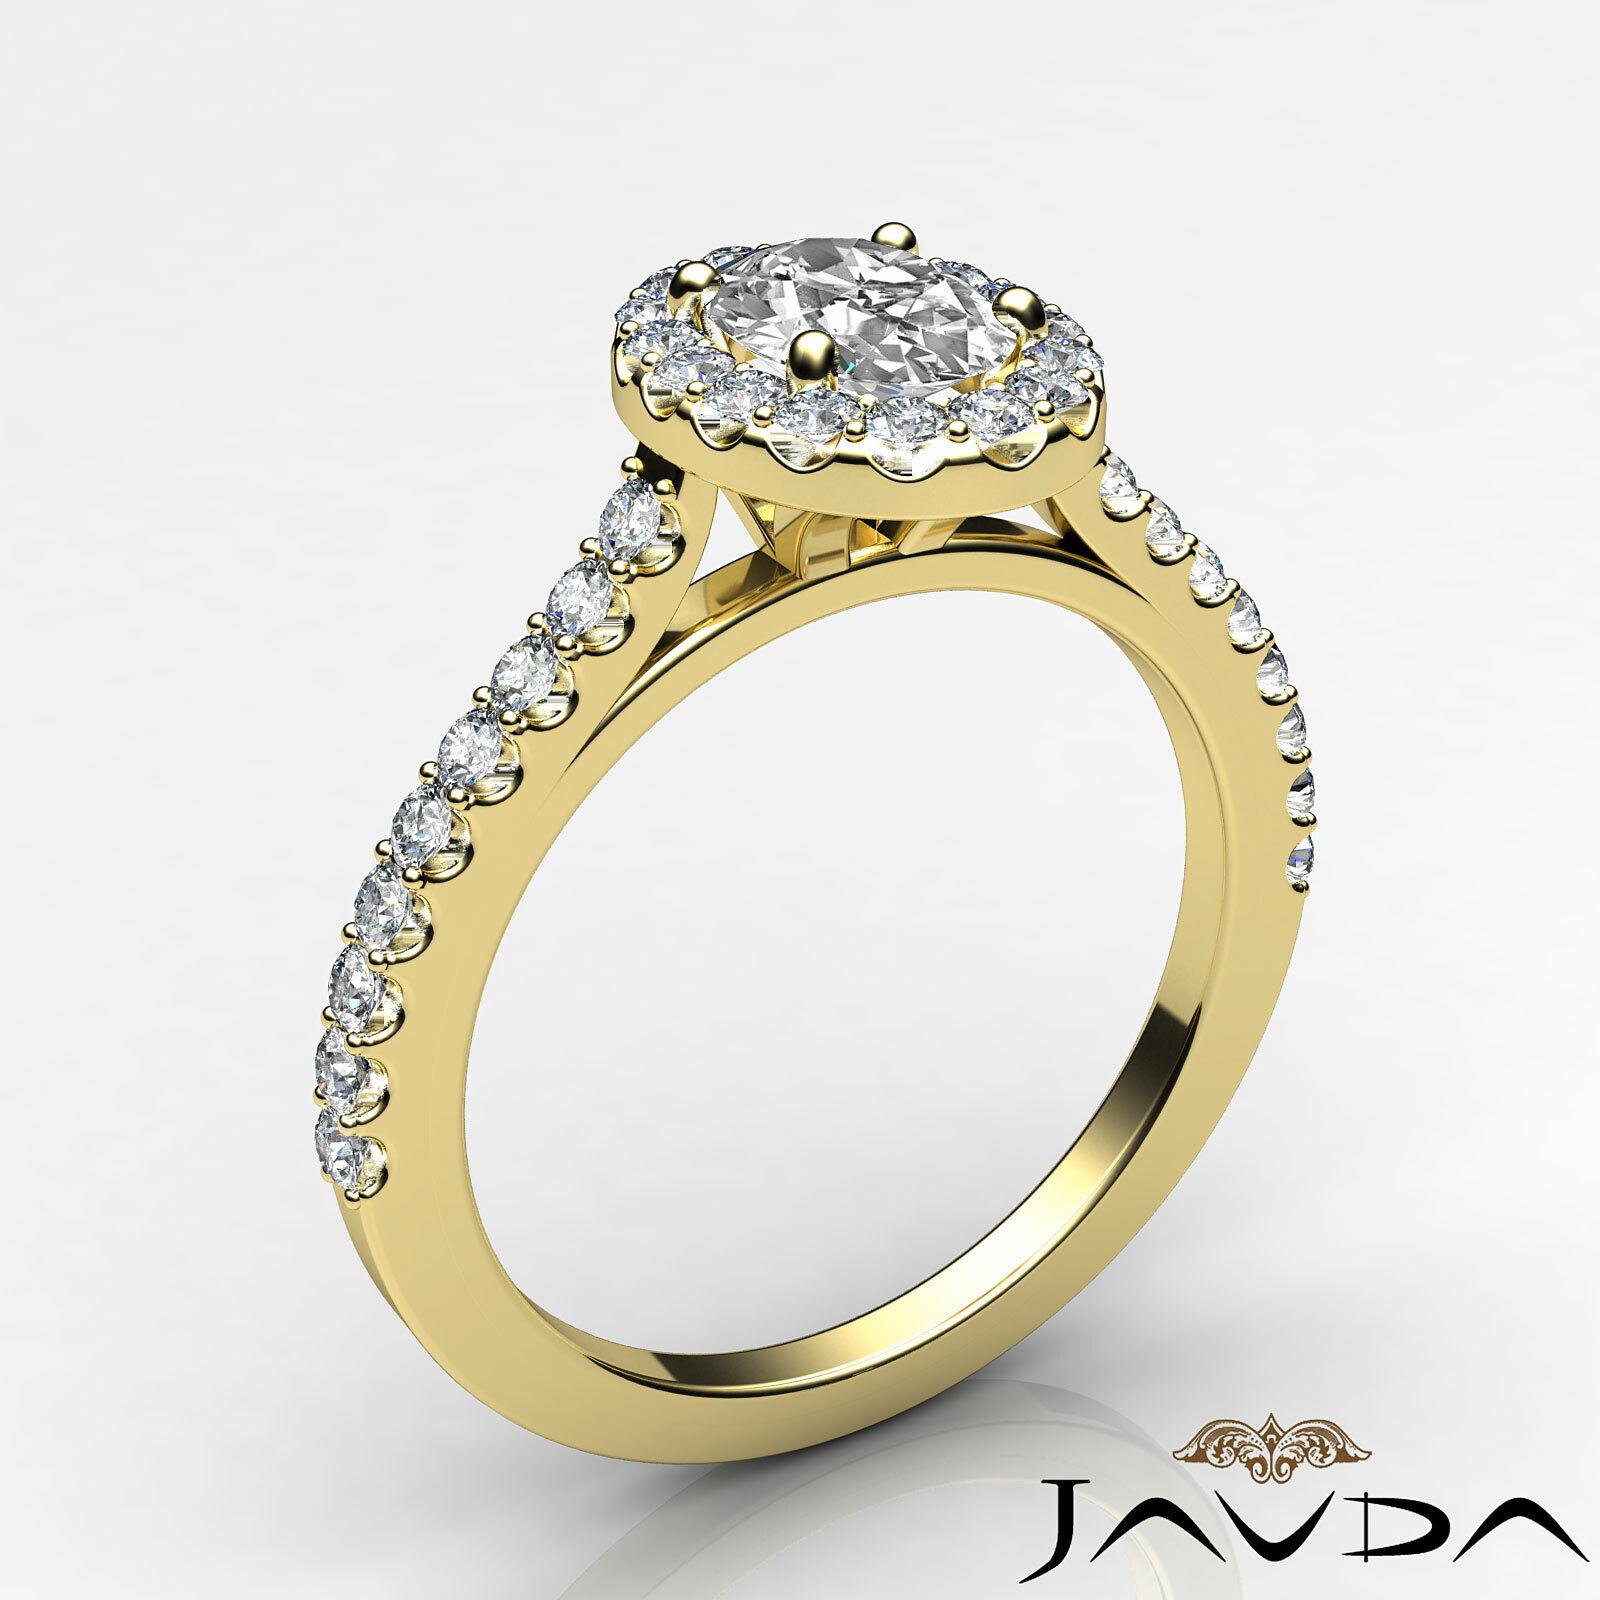 1.6ctw Prong Setting Oval Diamond Engagement Ring GIA H-VS1 White Gold Women New 8